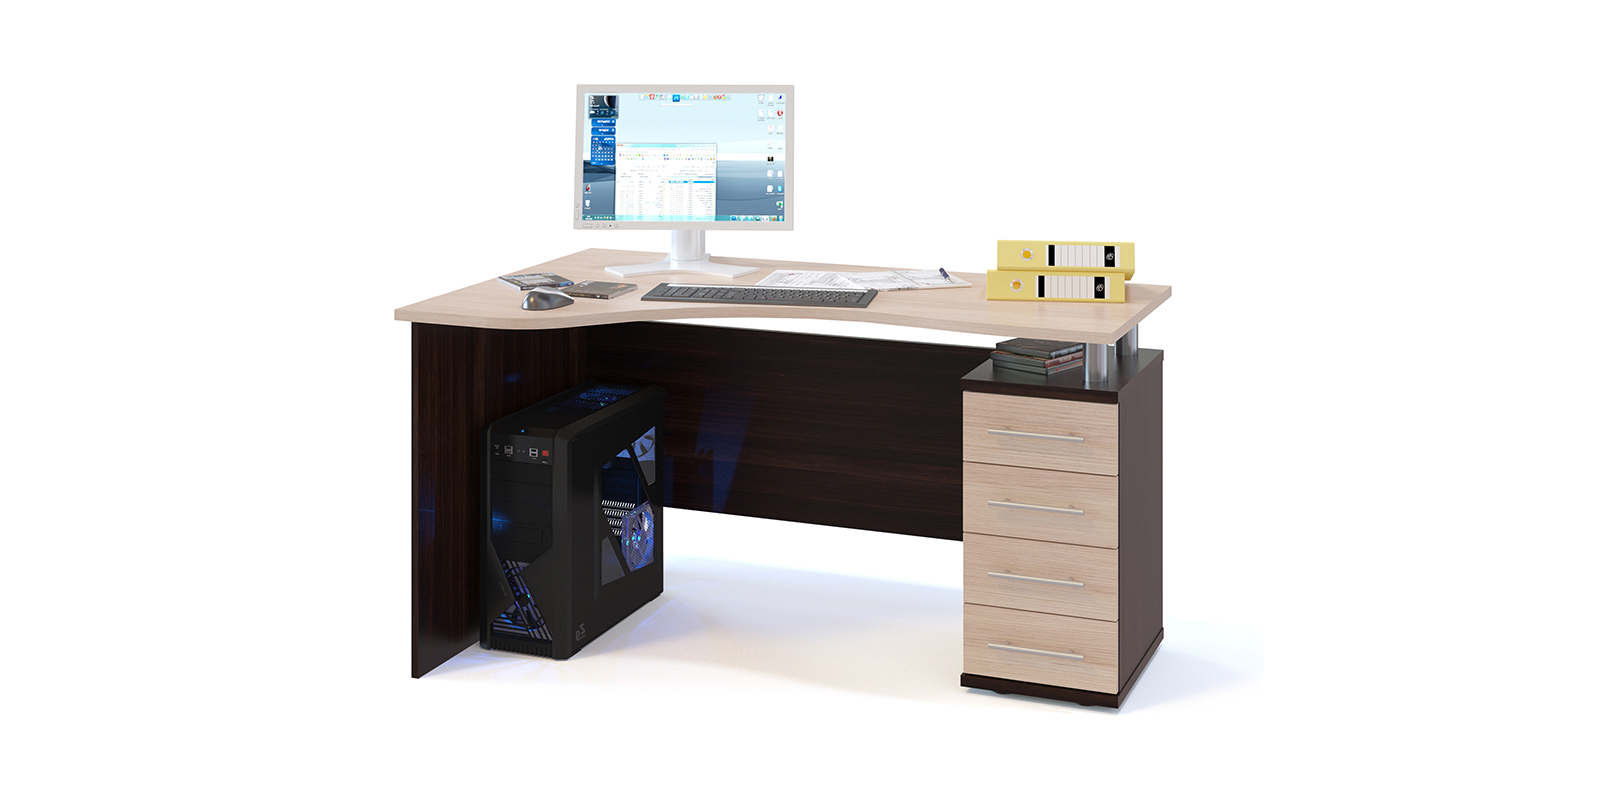 Стол компьютерный HomeMe Мерида AFU0079000